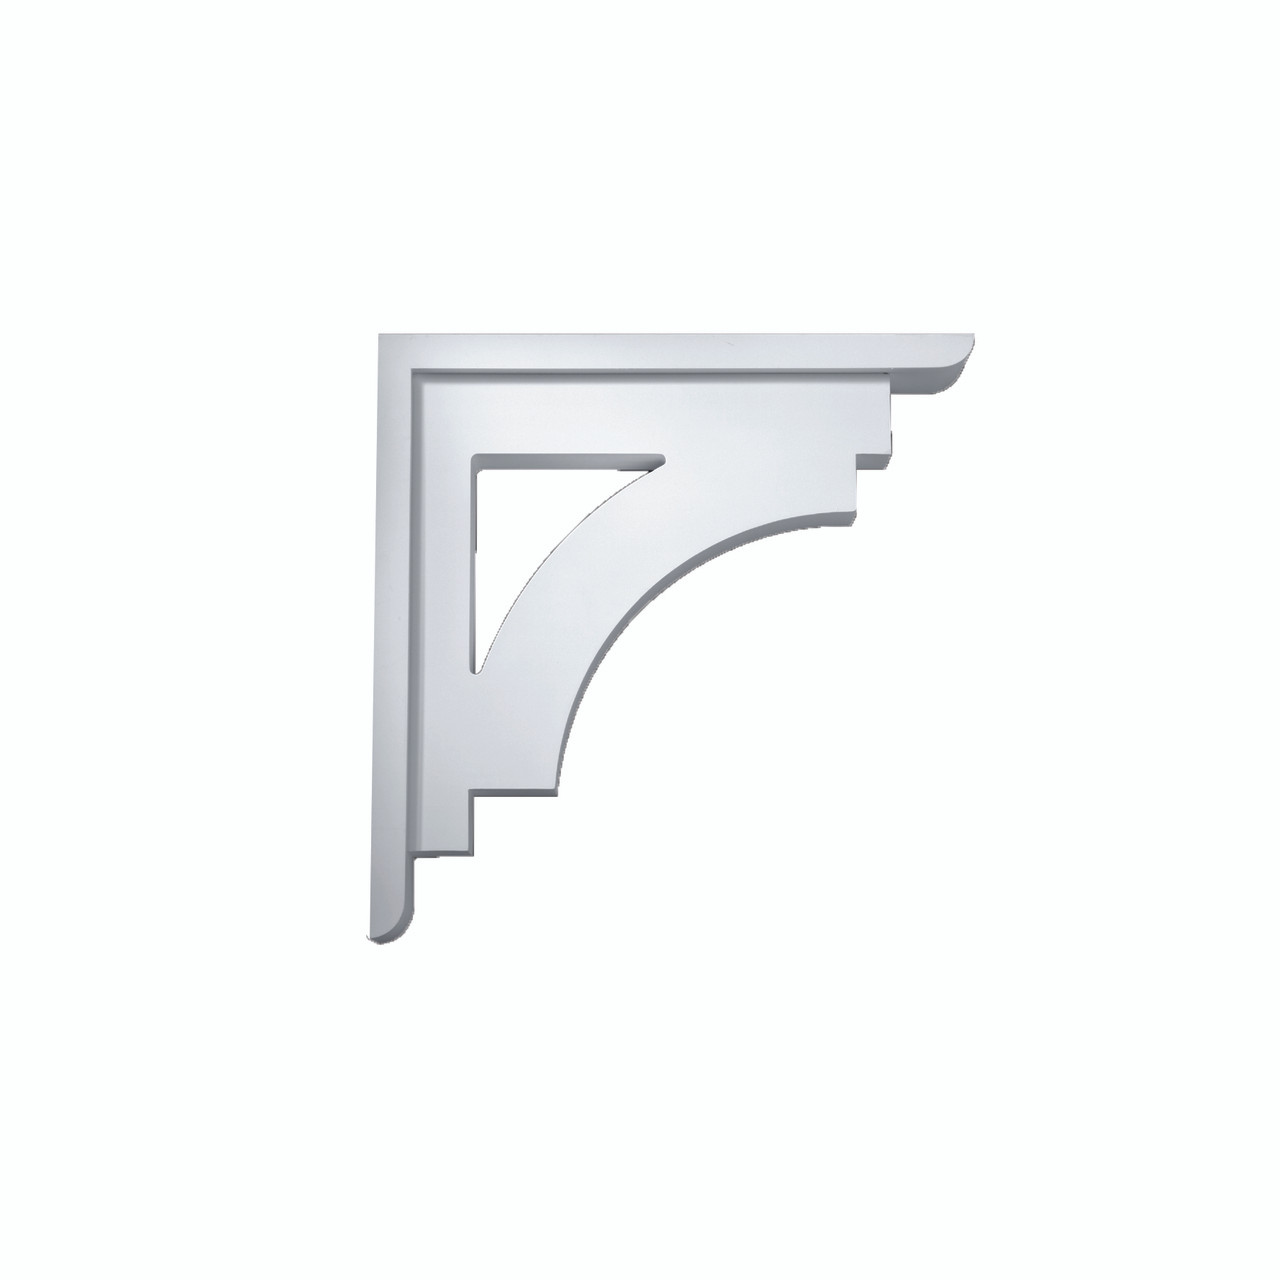 Bkt25x25 for Fypon quick rail